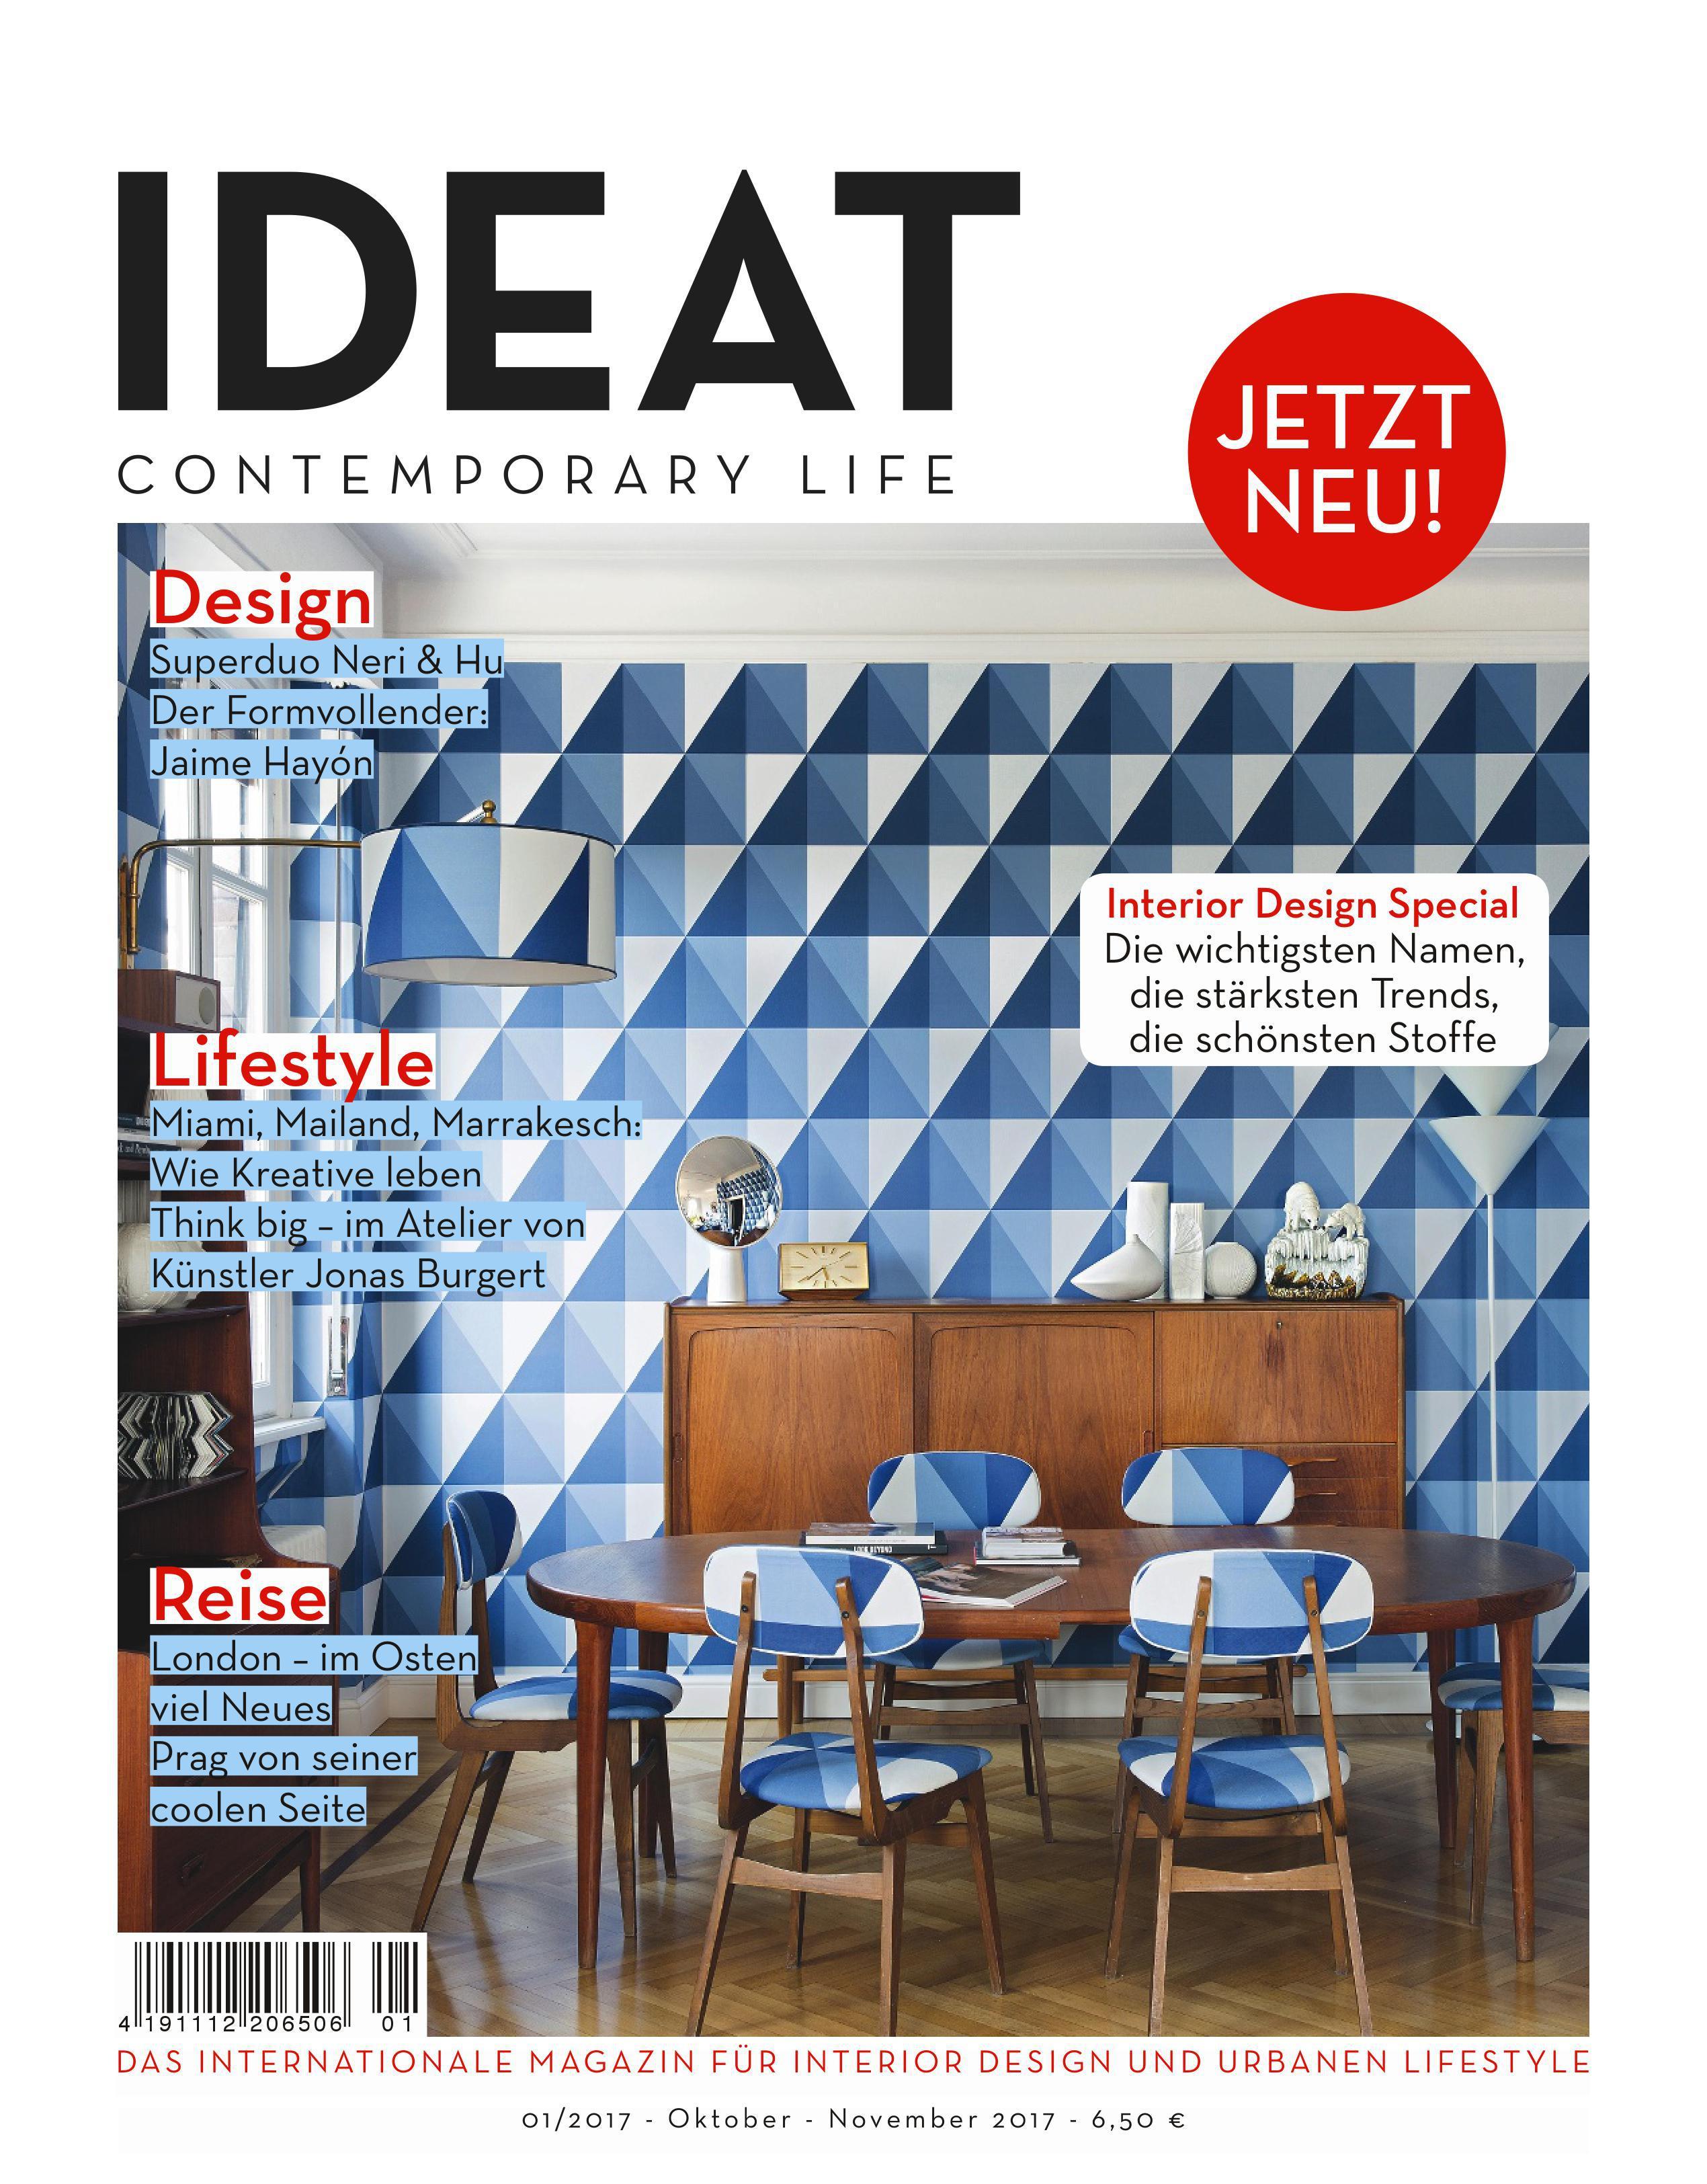 PUB_2017_IDEAT_Vincent Van Duysen